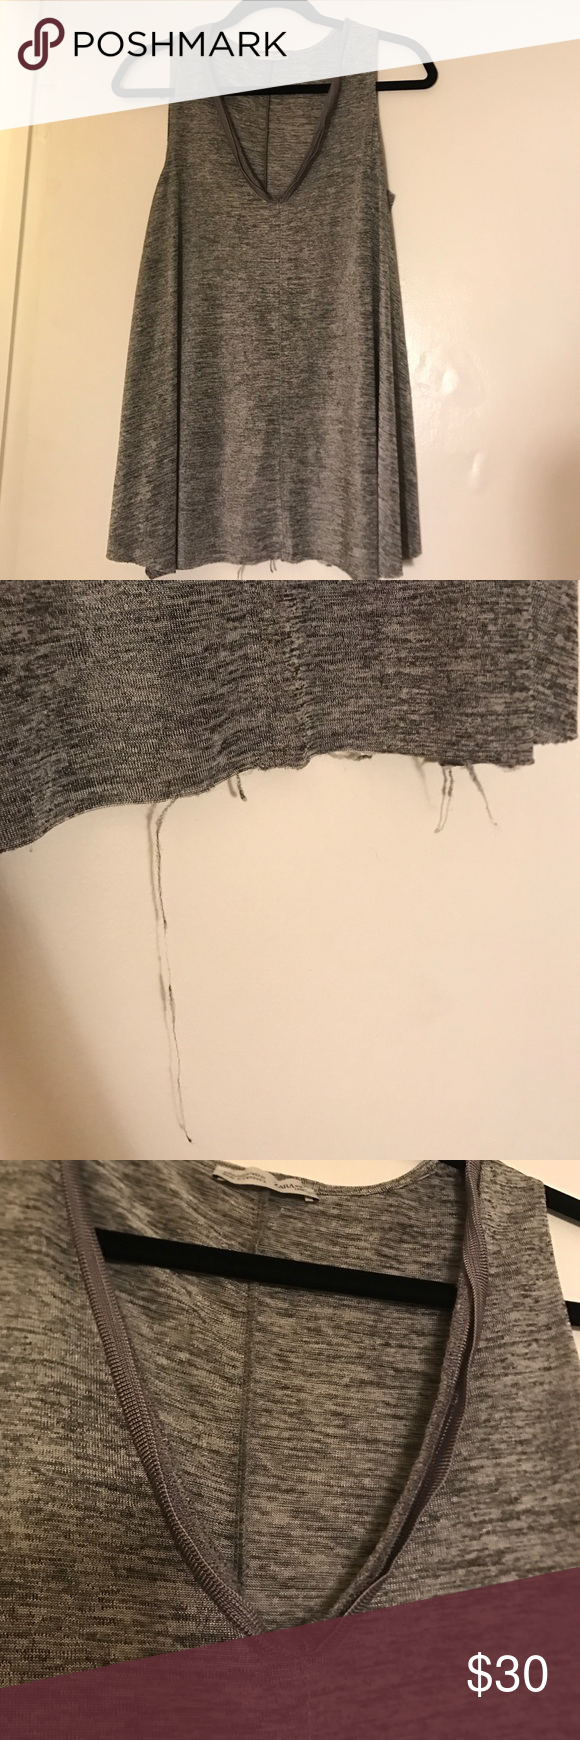 Zara long knit shiny tank Never worn, fraying is part of style Zara Tops Tank Tops